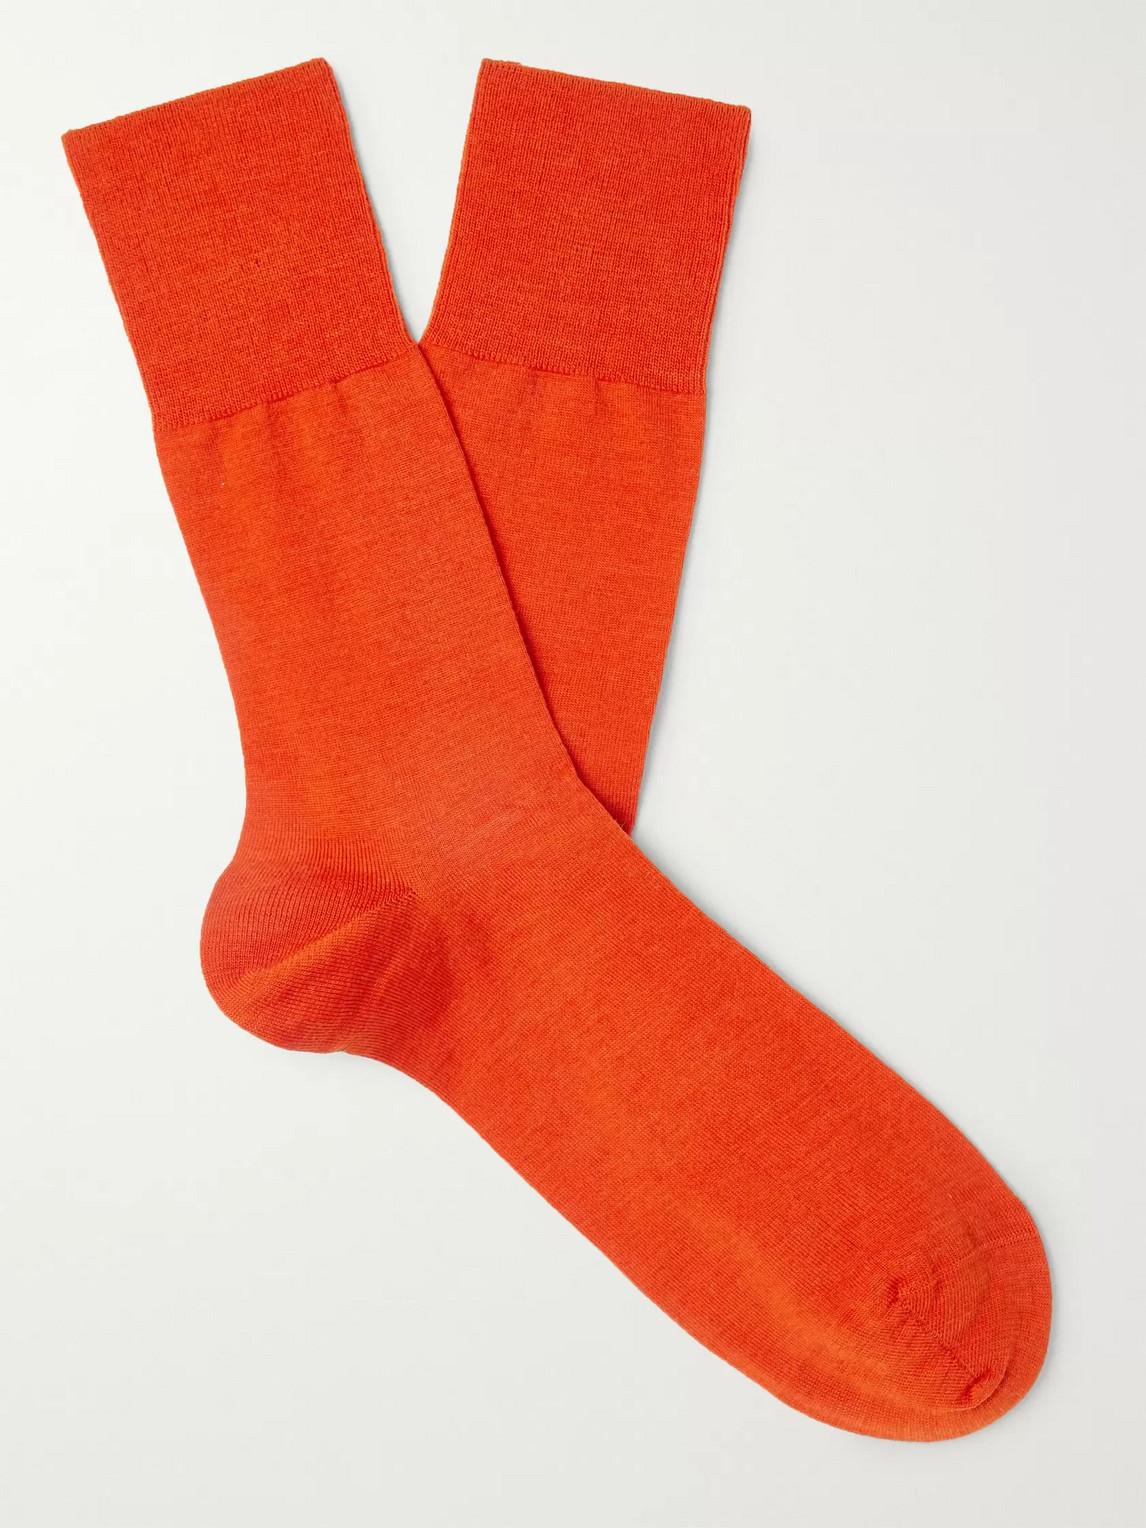 falke - airport city virgin wool-blend socks - men - red